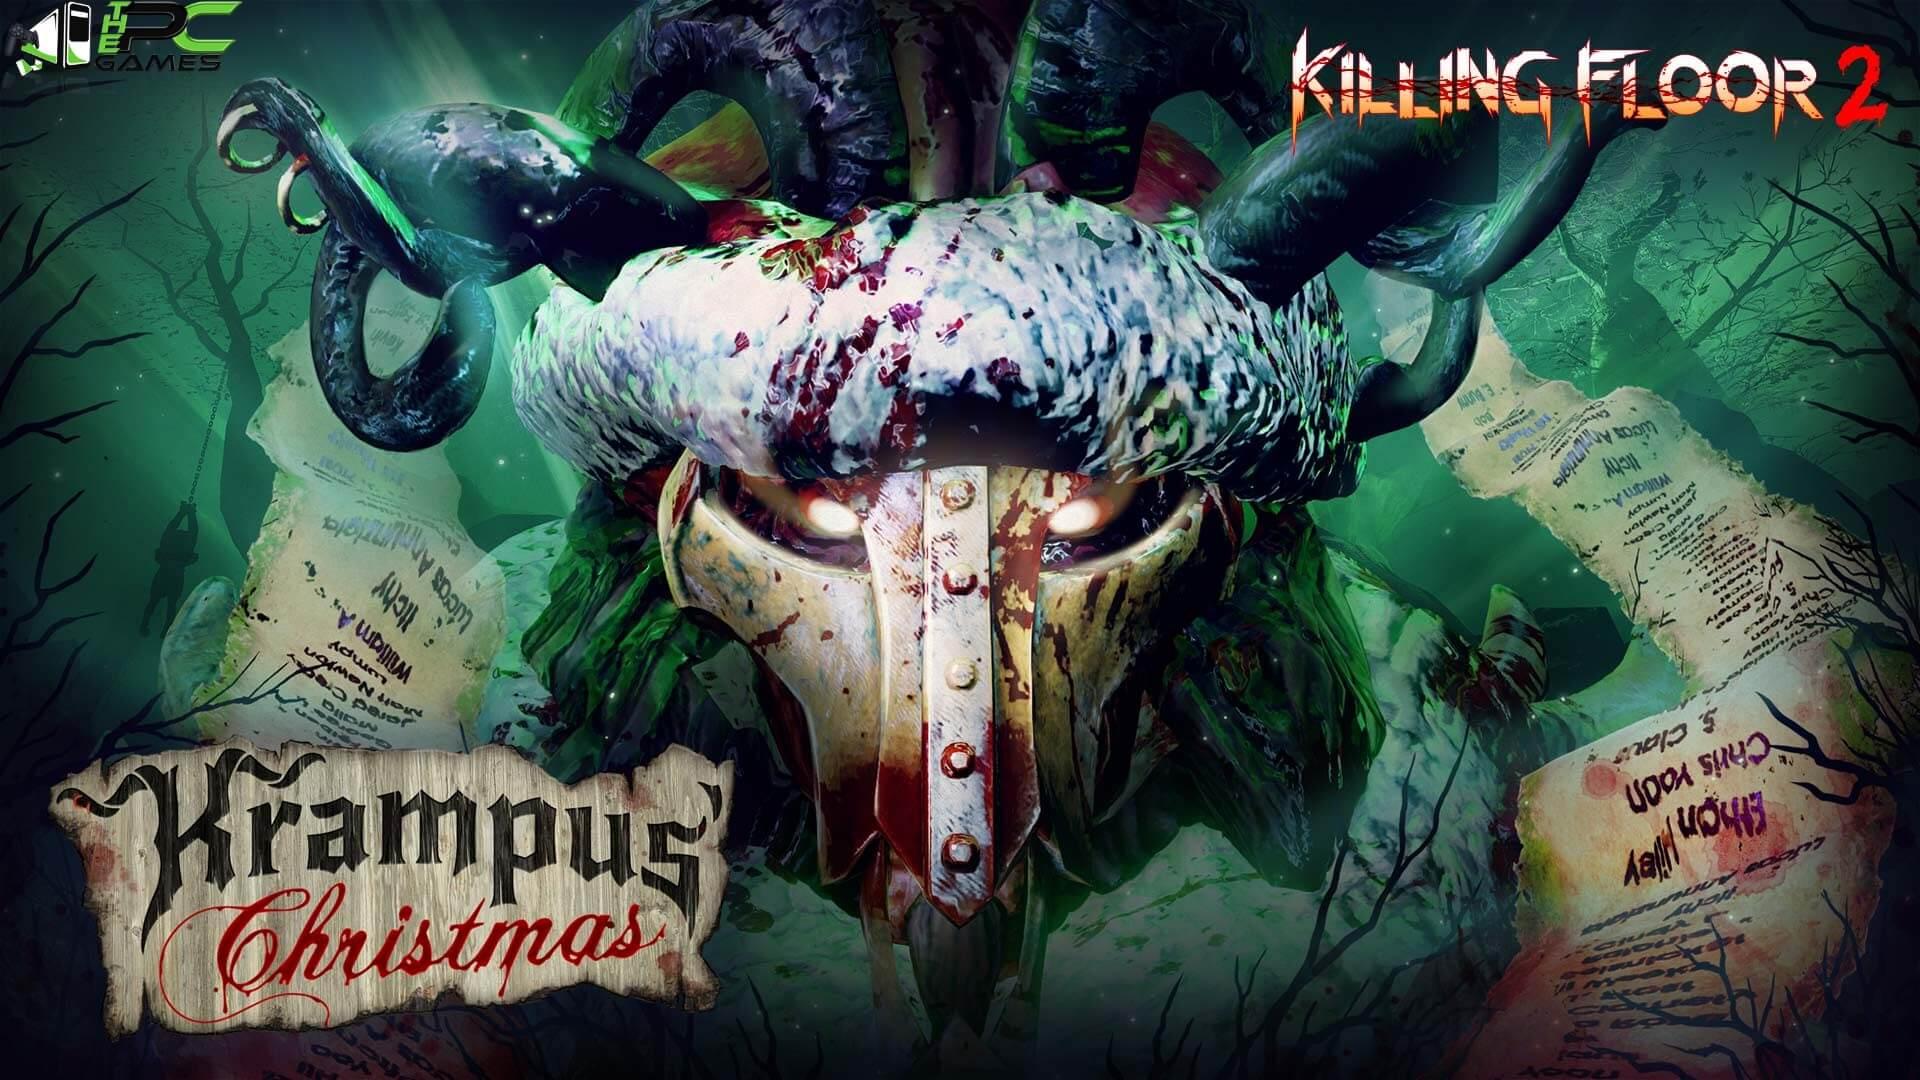 Killing Floor 2 Krampus Christmas Free Download